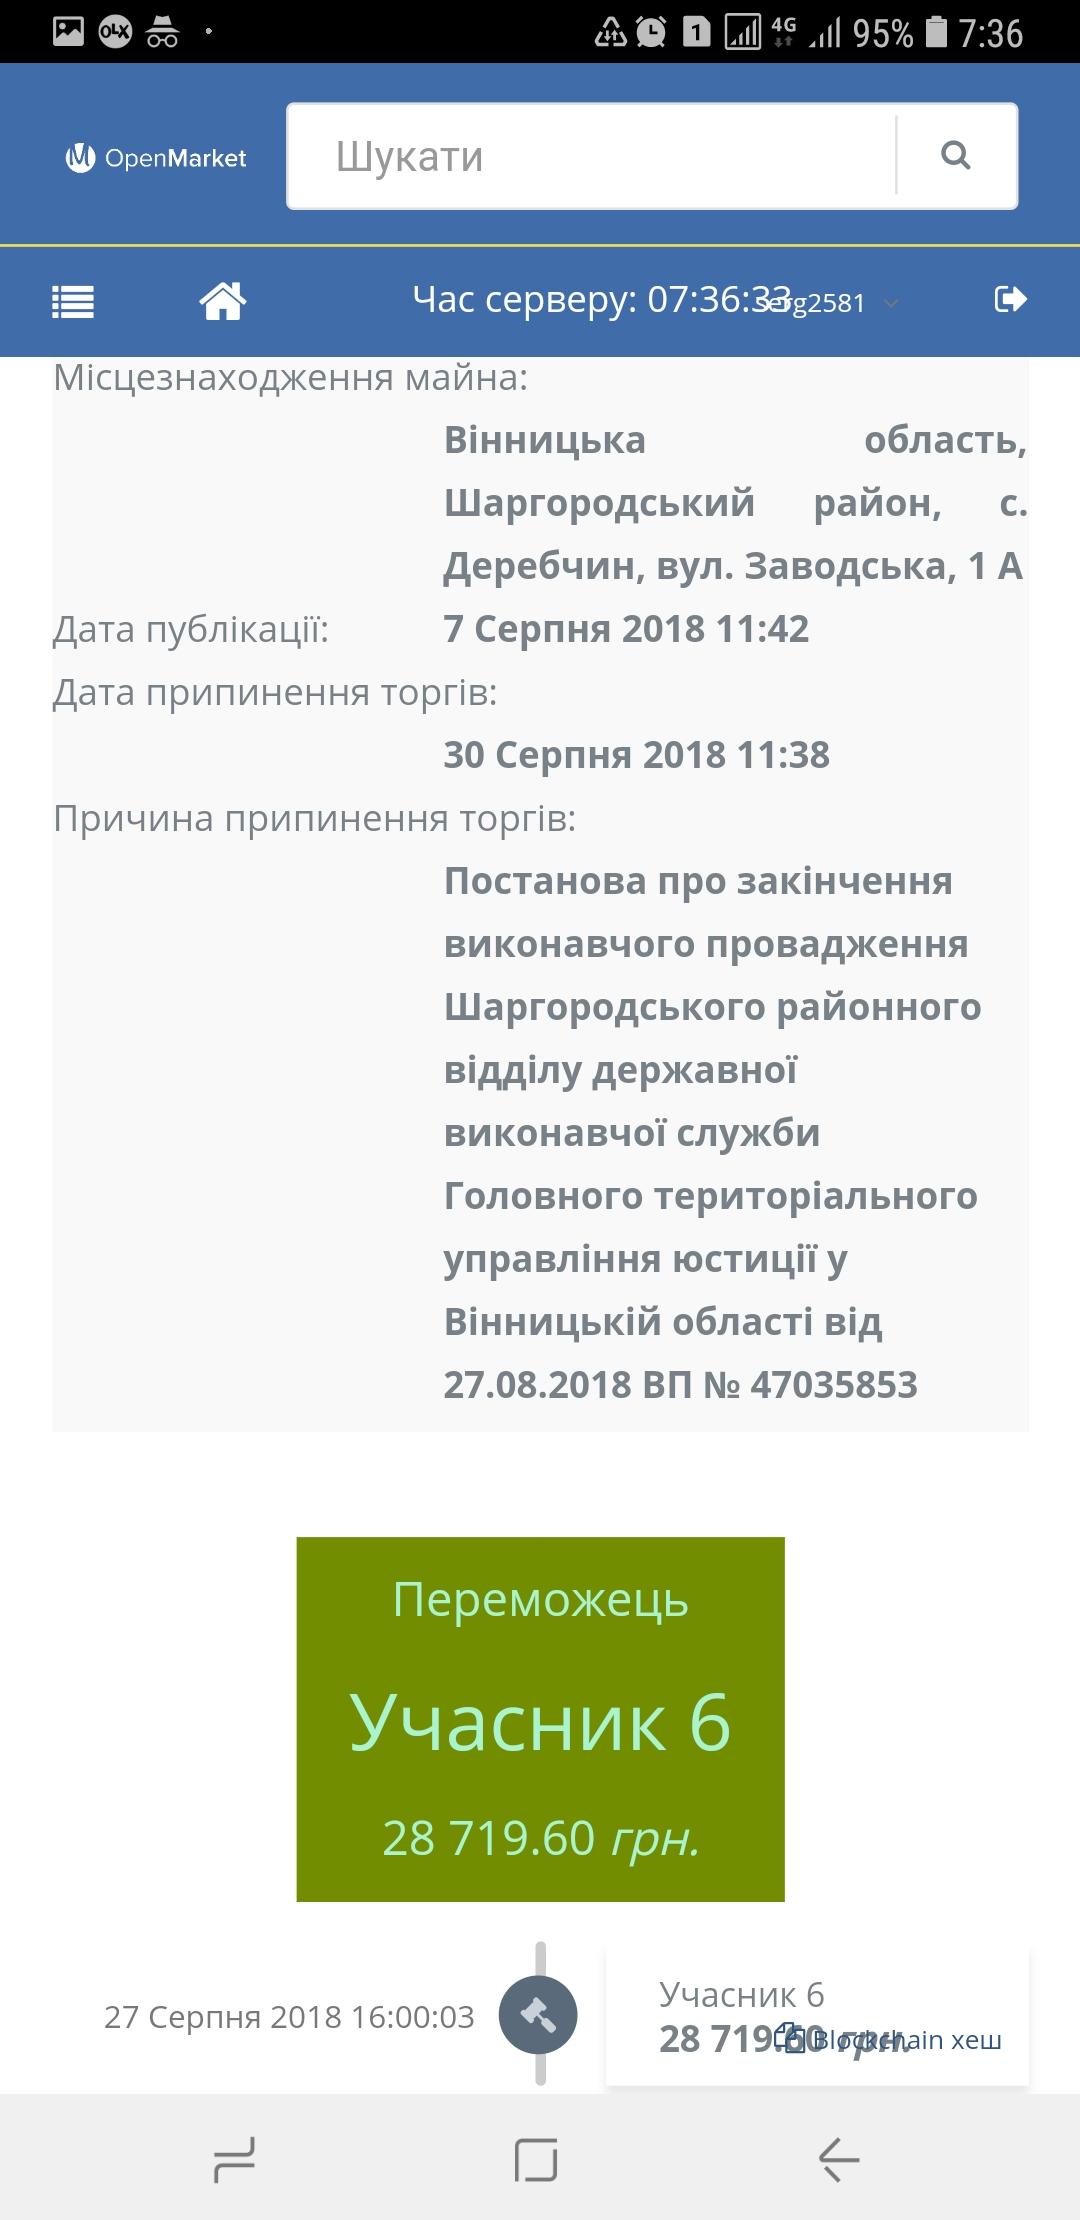 image http://forum.setam.net.ua/assets/images/572-SBZ0O3zfmTowqOyu.jpeg